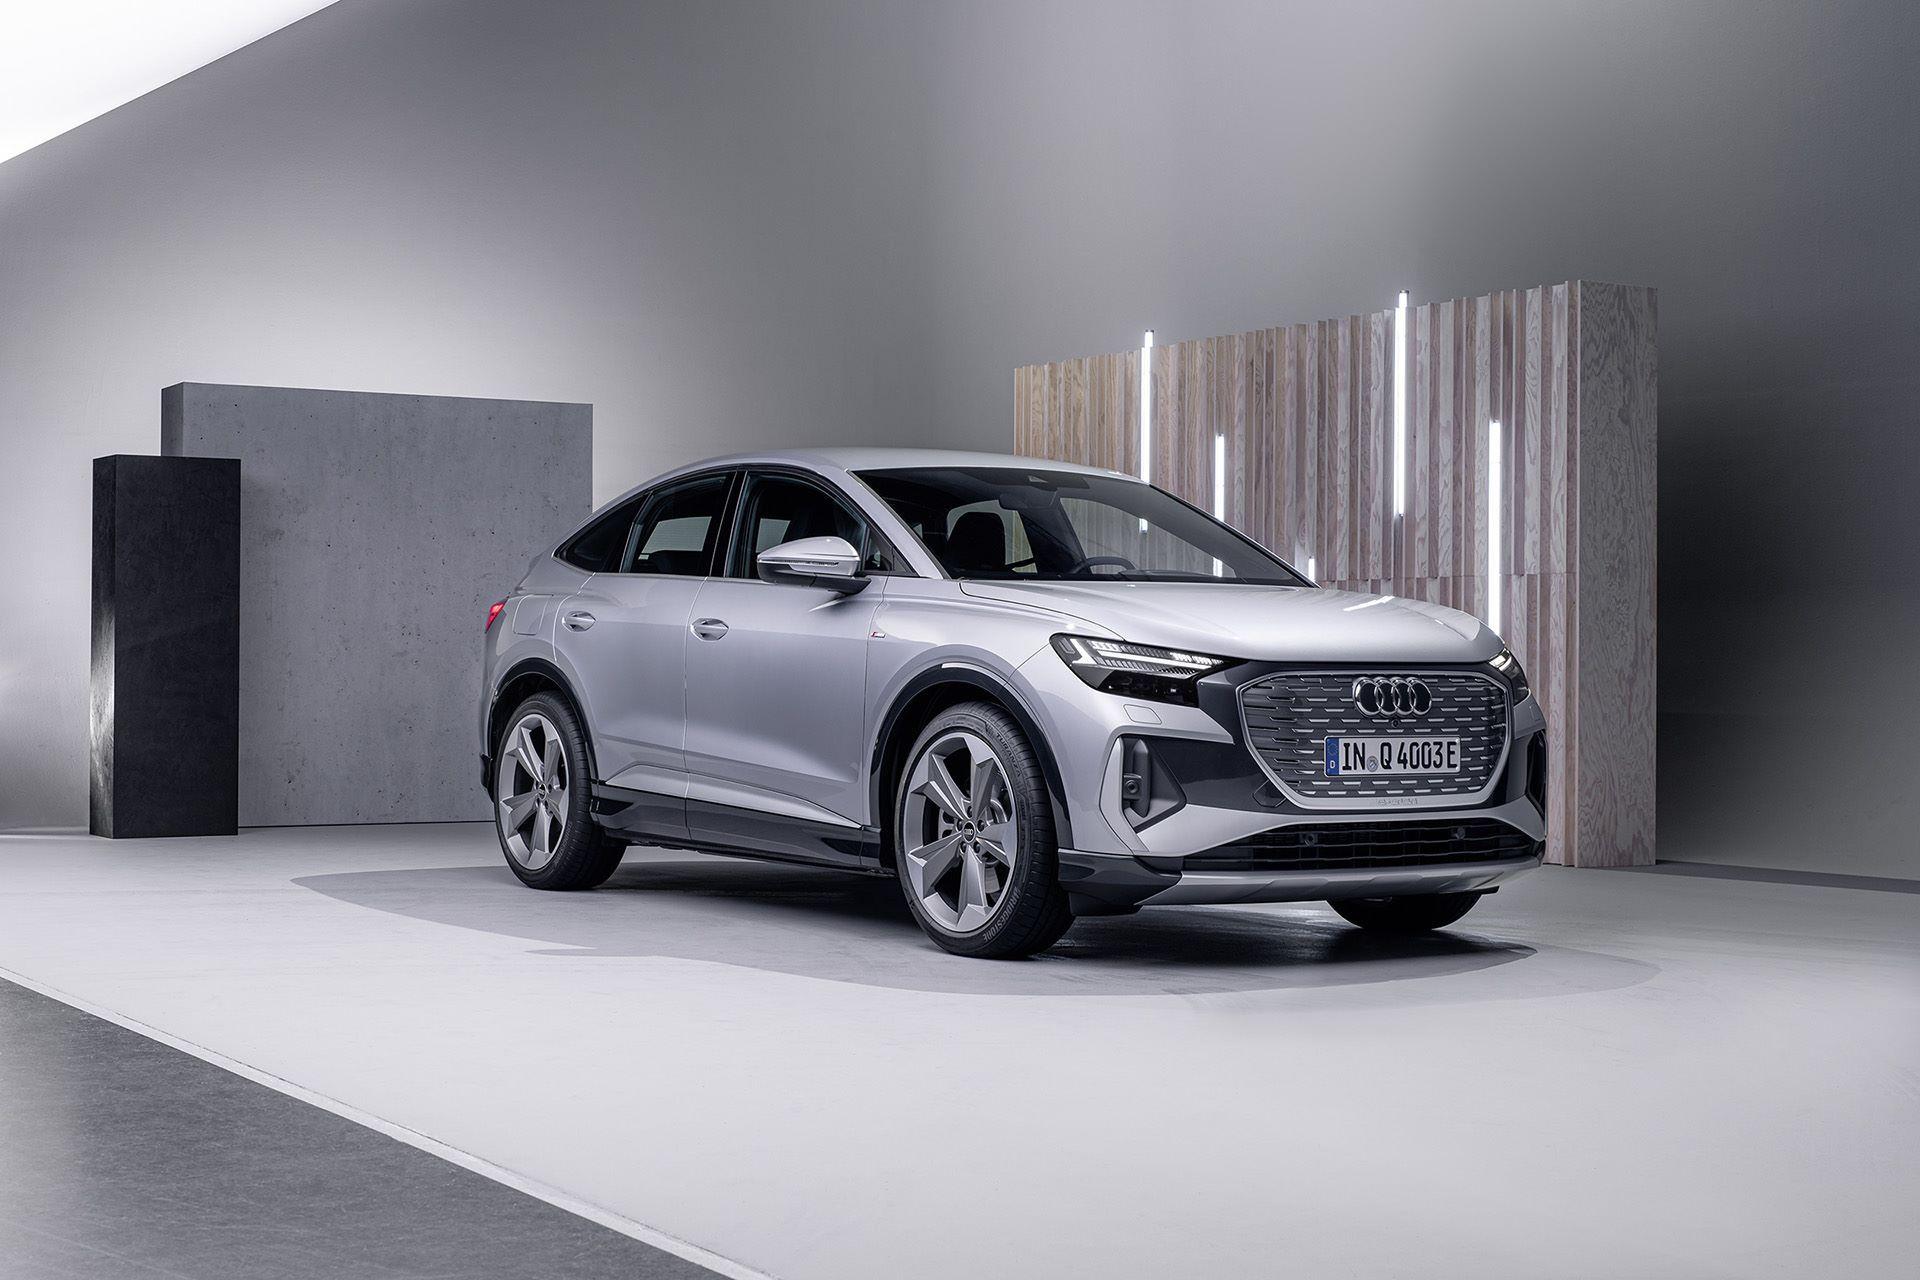 Audi-Q4-e-tron-and-Q4-e-tron-Sportback-28